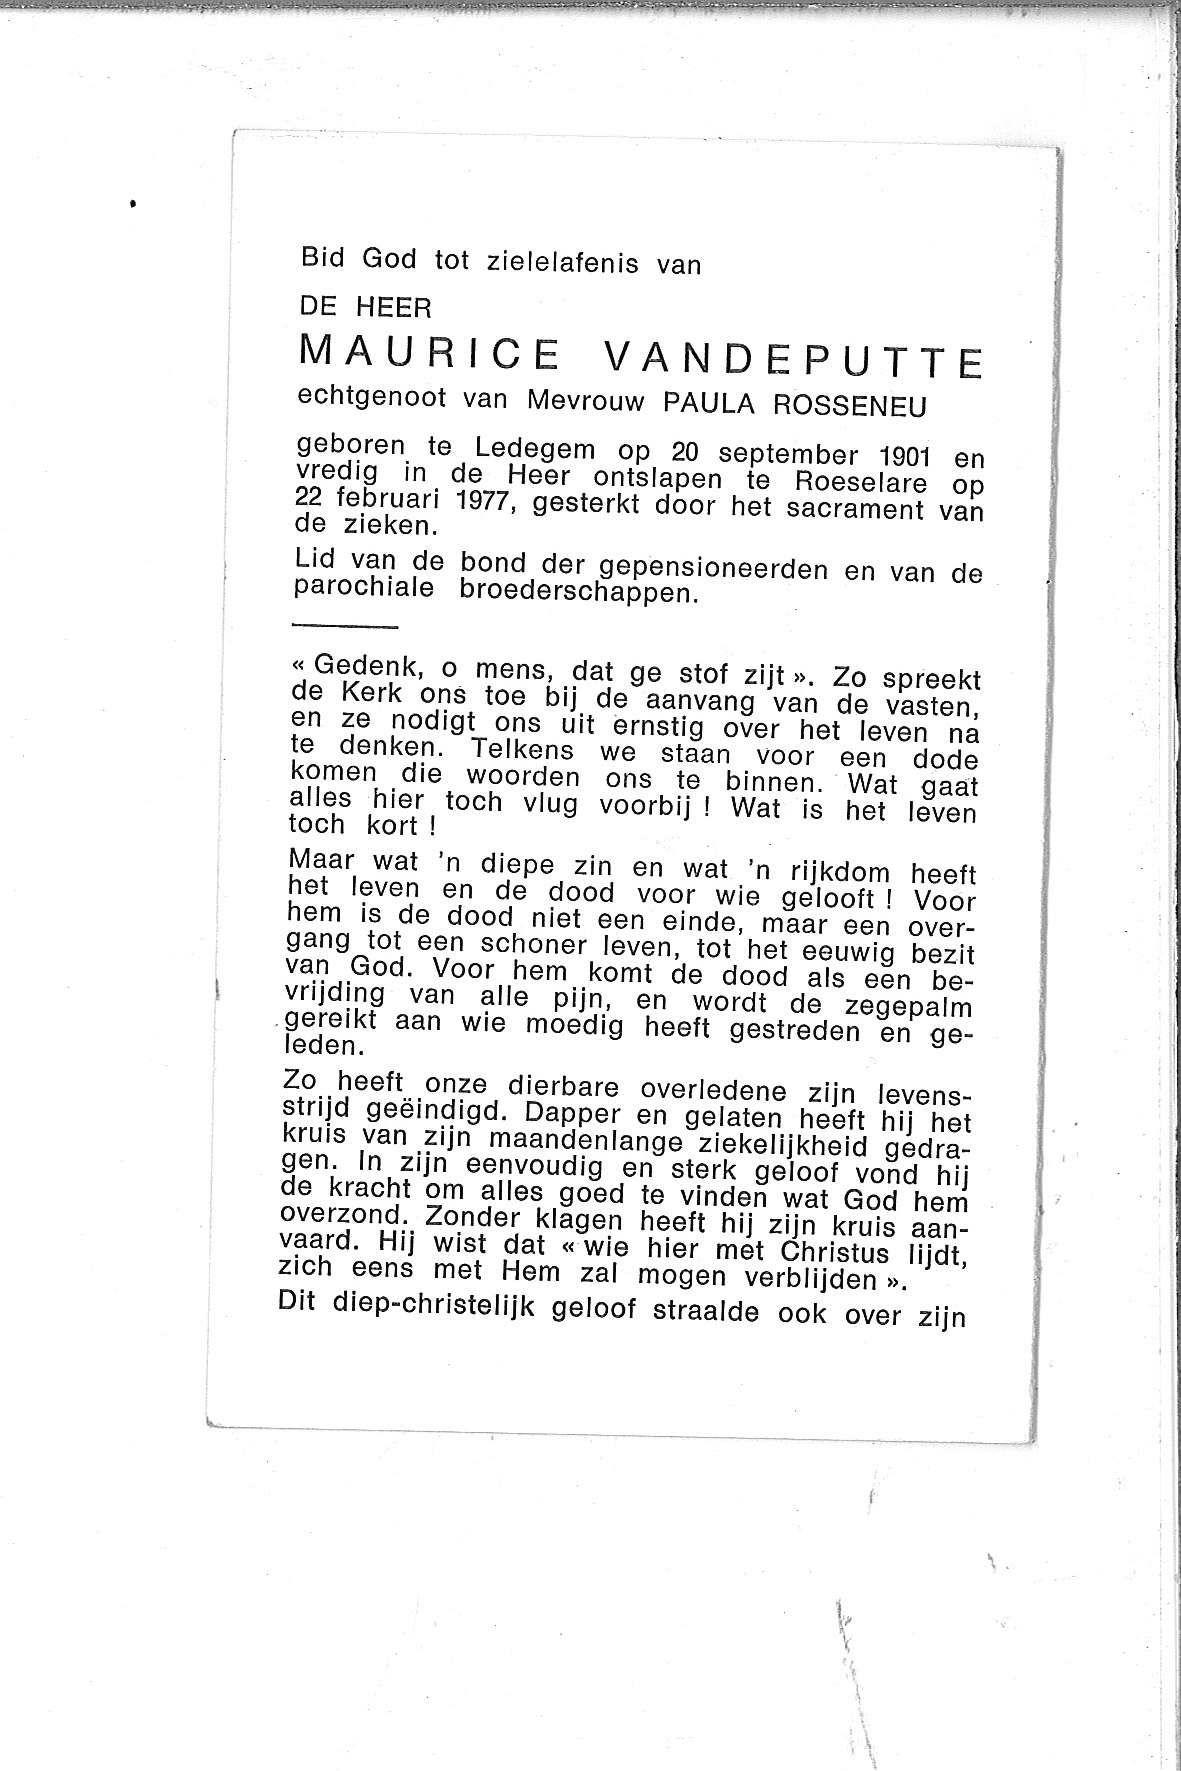 Maurice(1977)20131023134903_00099.jpg